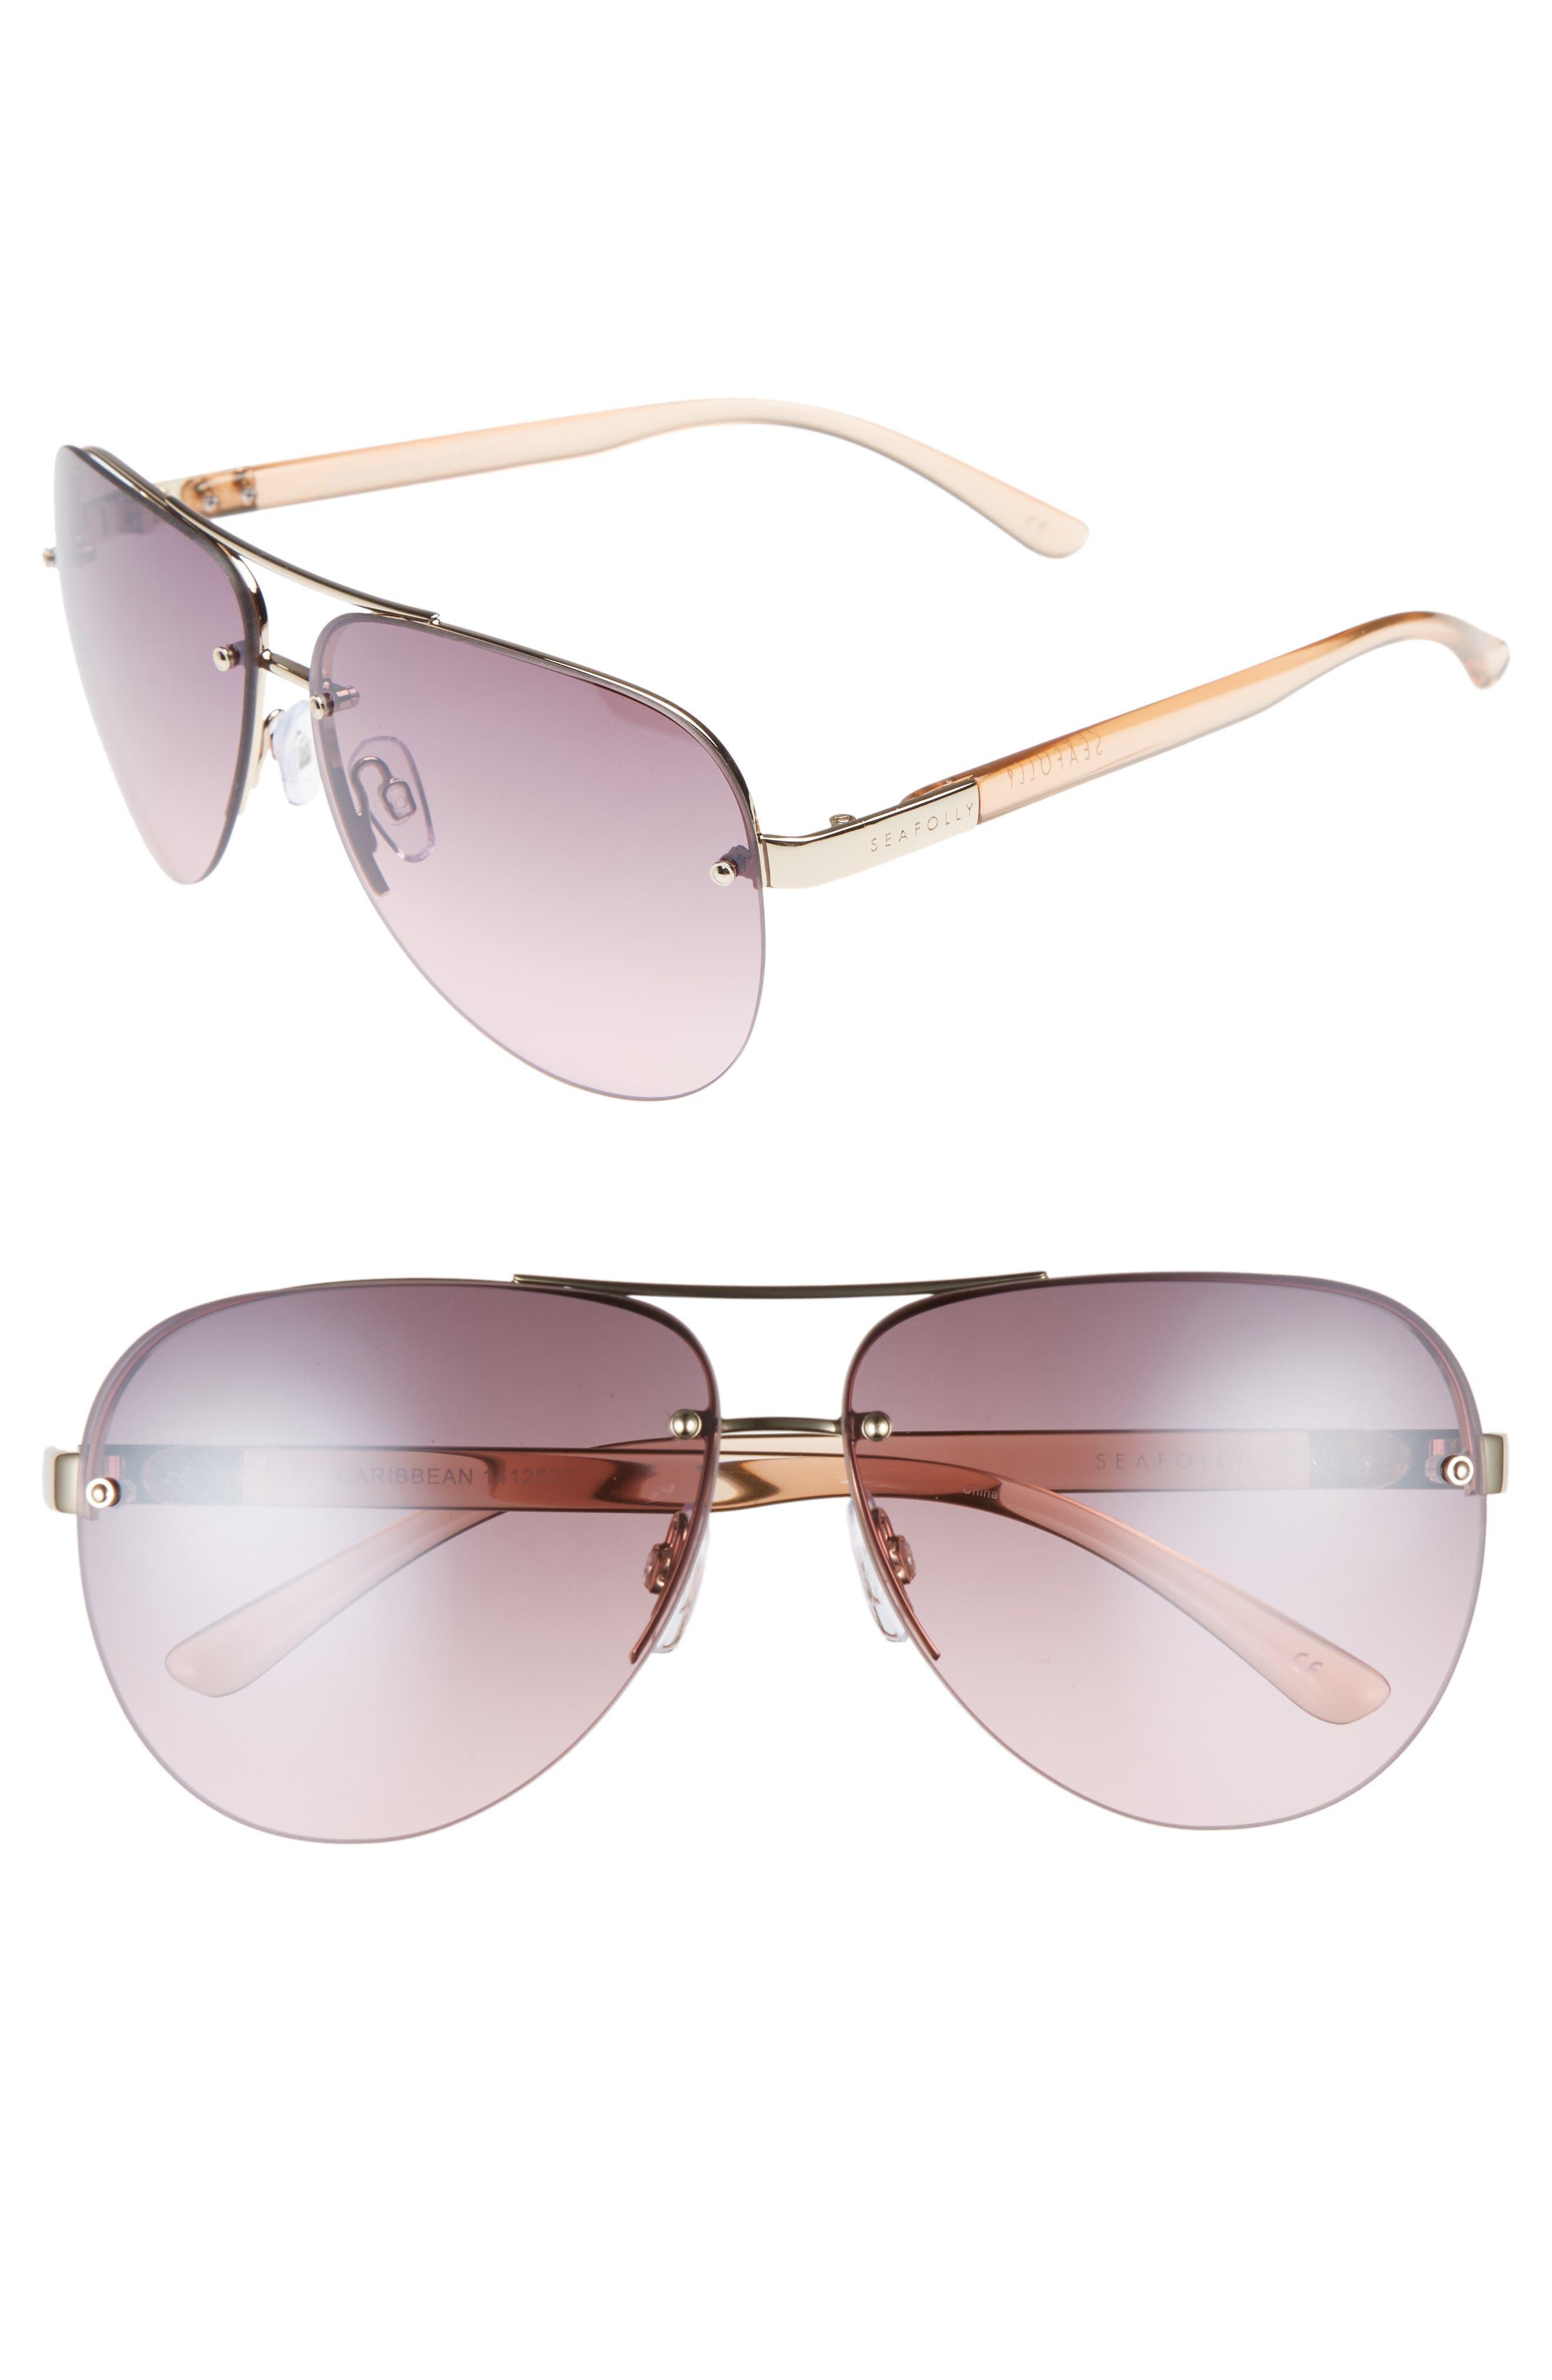 Caribbean 62mm Rimless Aviator Sunglasses,                             Main thumbnail 1, color,                             Gold